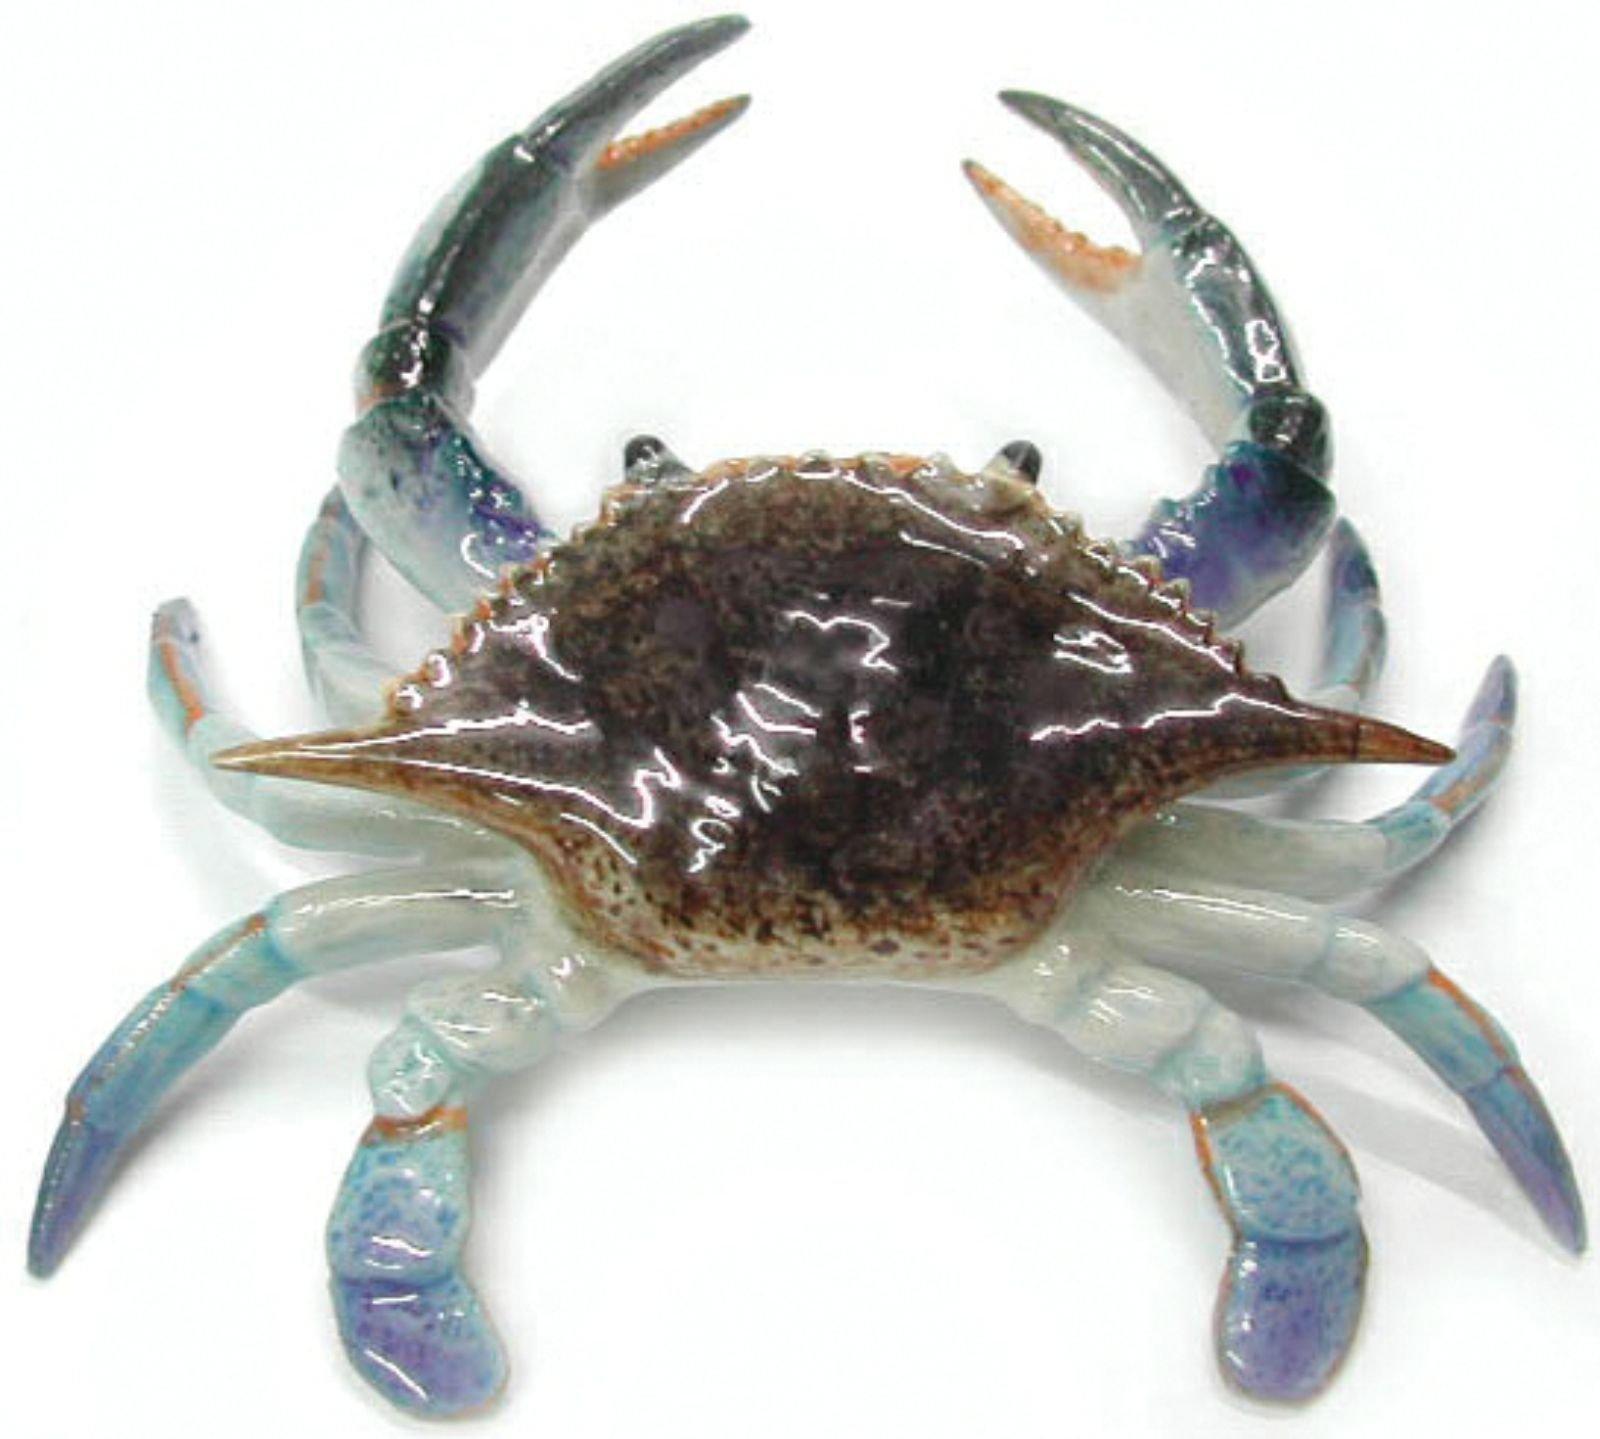 recipe: order live blue crabs online [37]